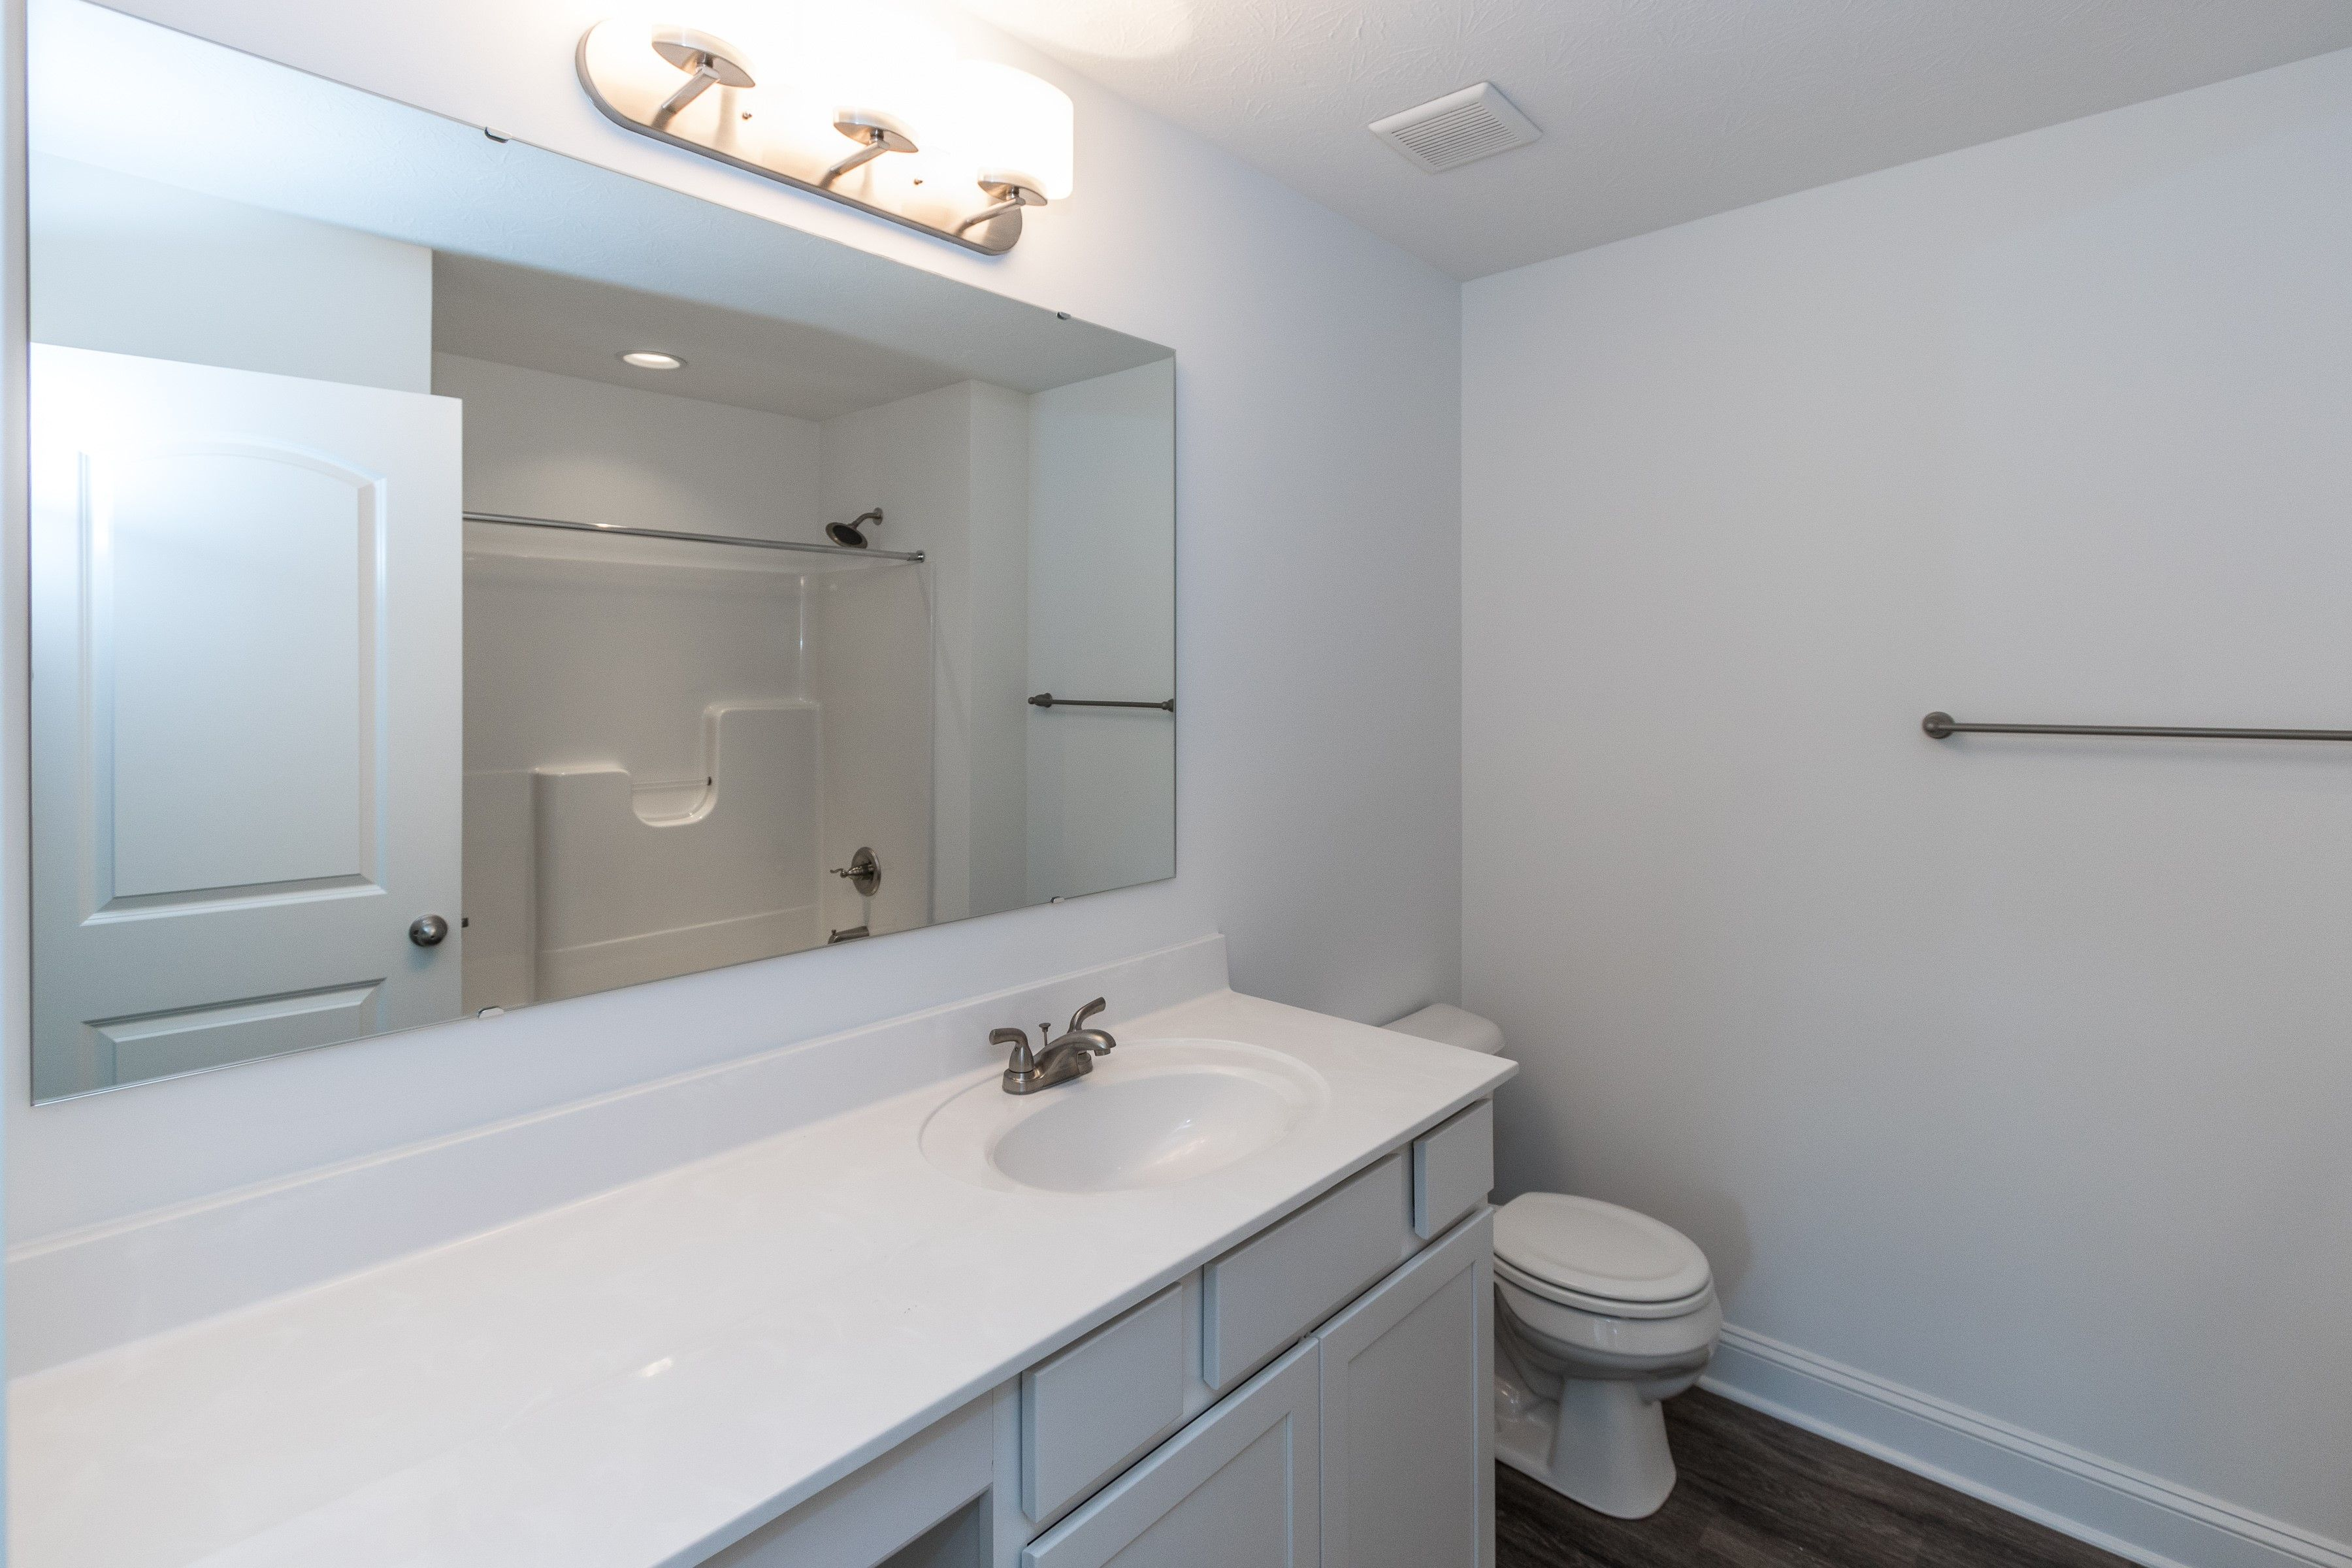 3 bedroom loft house  Area  Sq Ft Bedrooms  or  plus loft Bathrooms  Levels